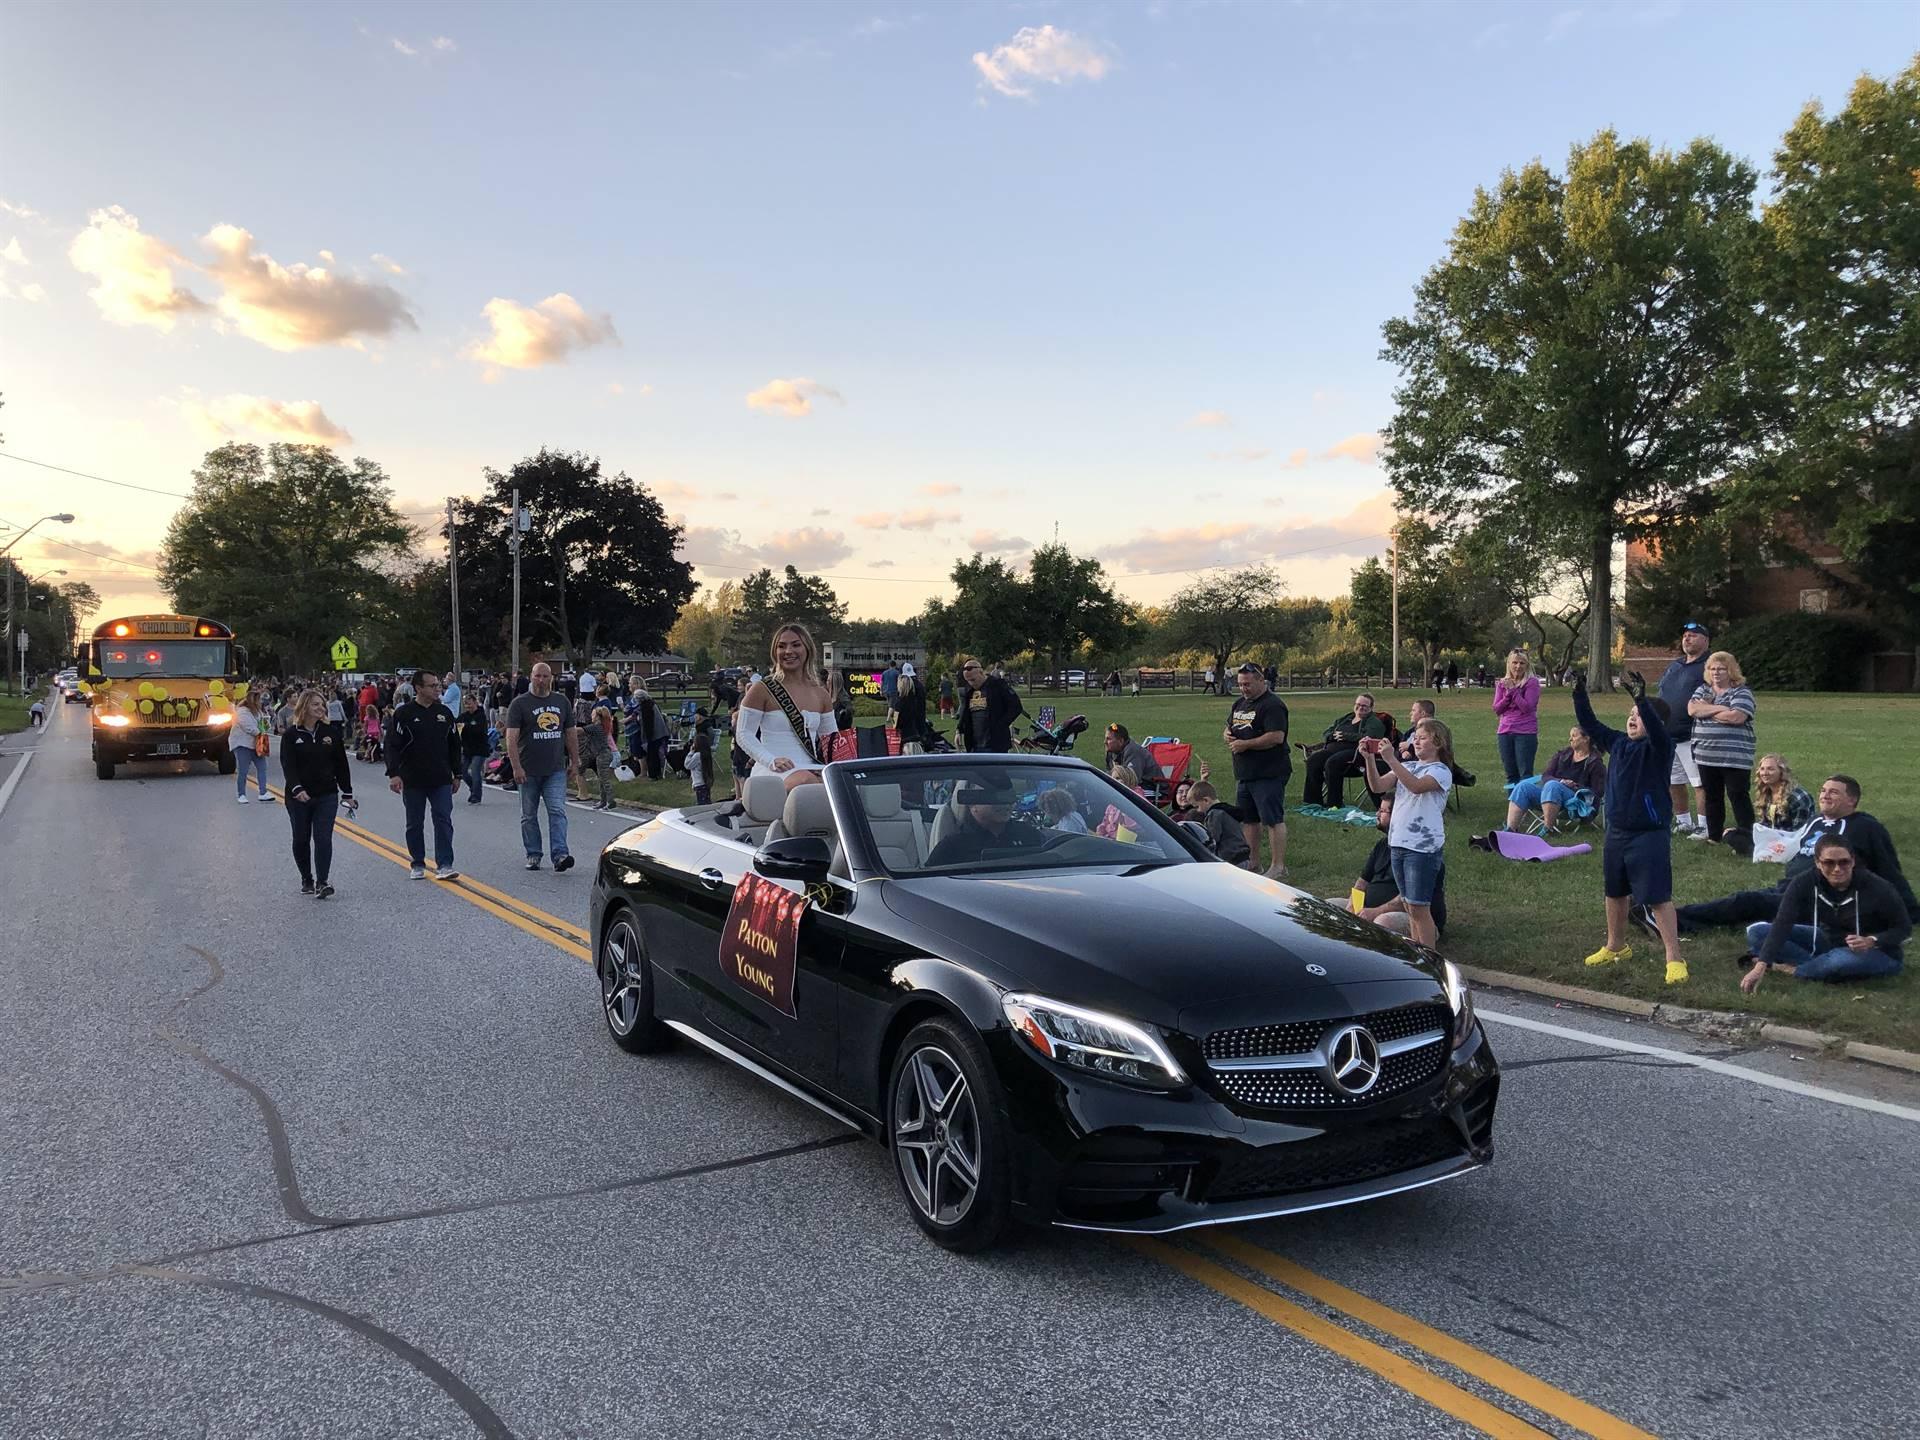 HC Parade